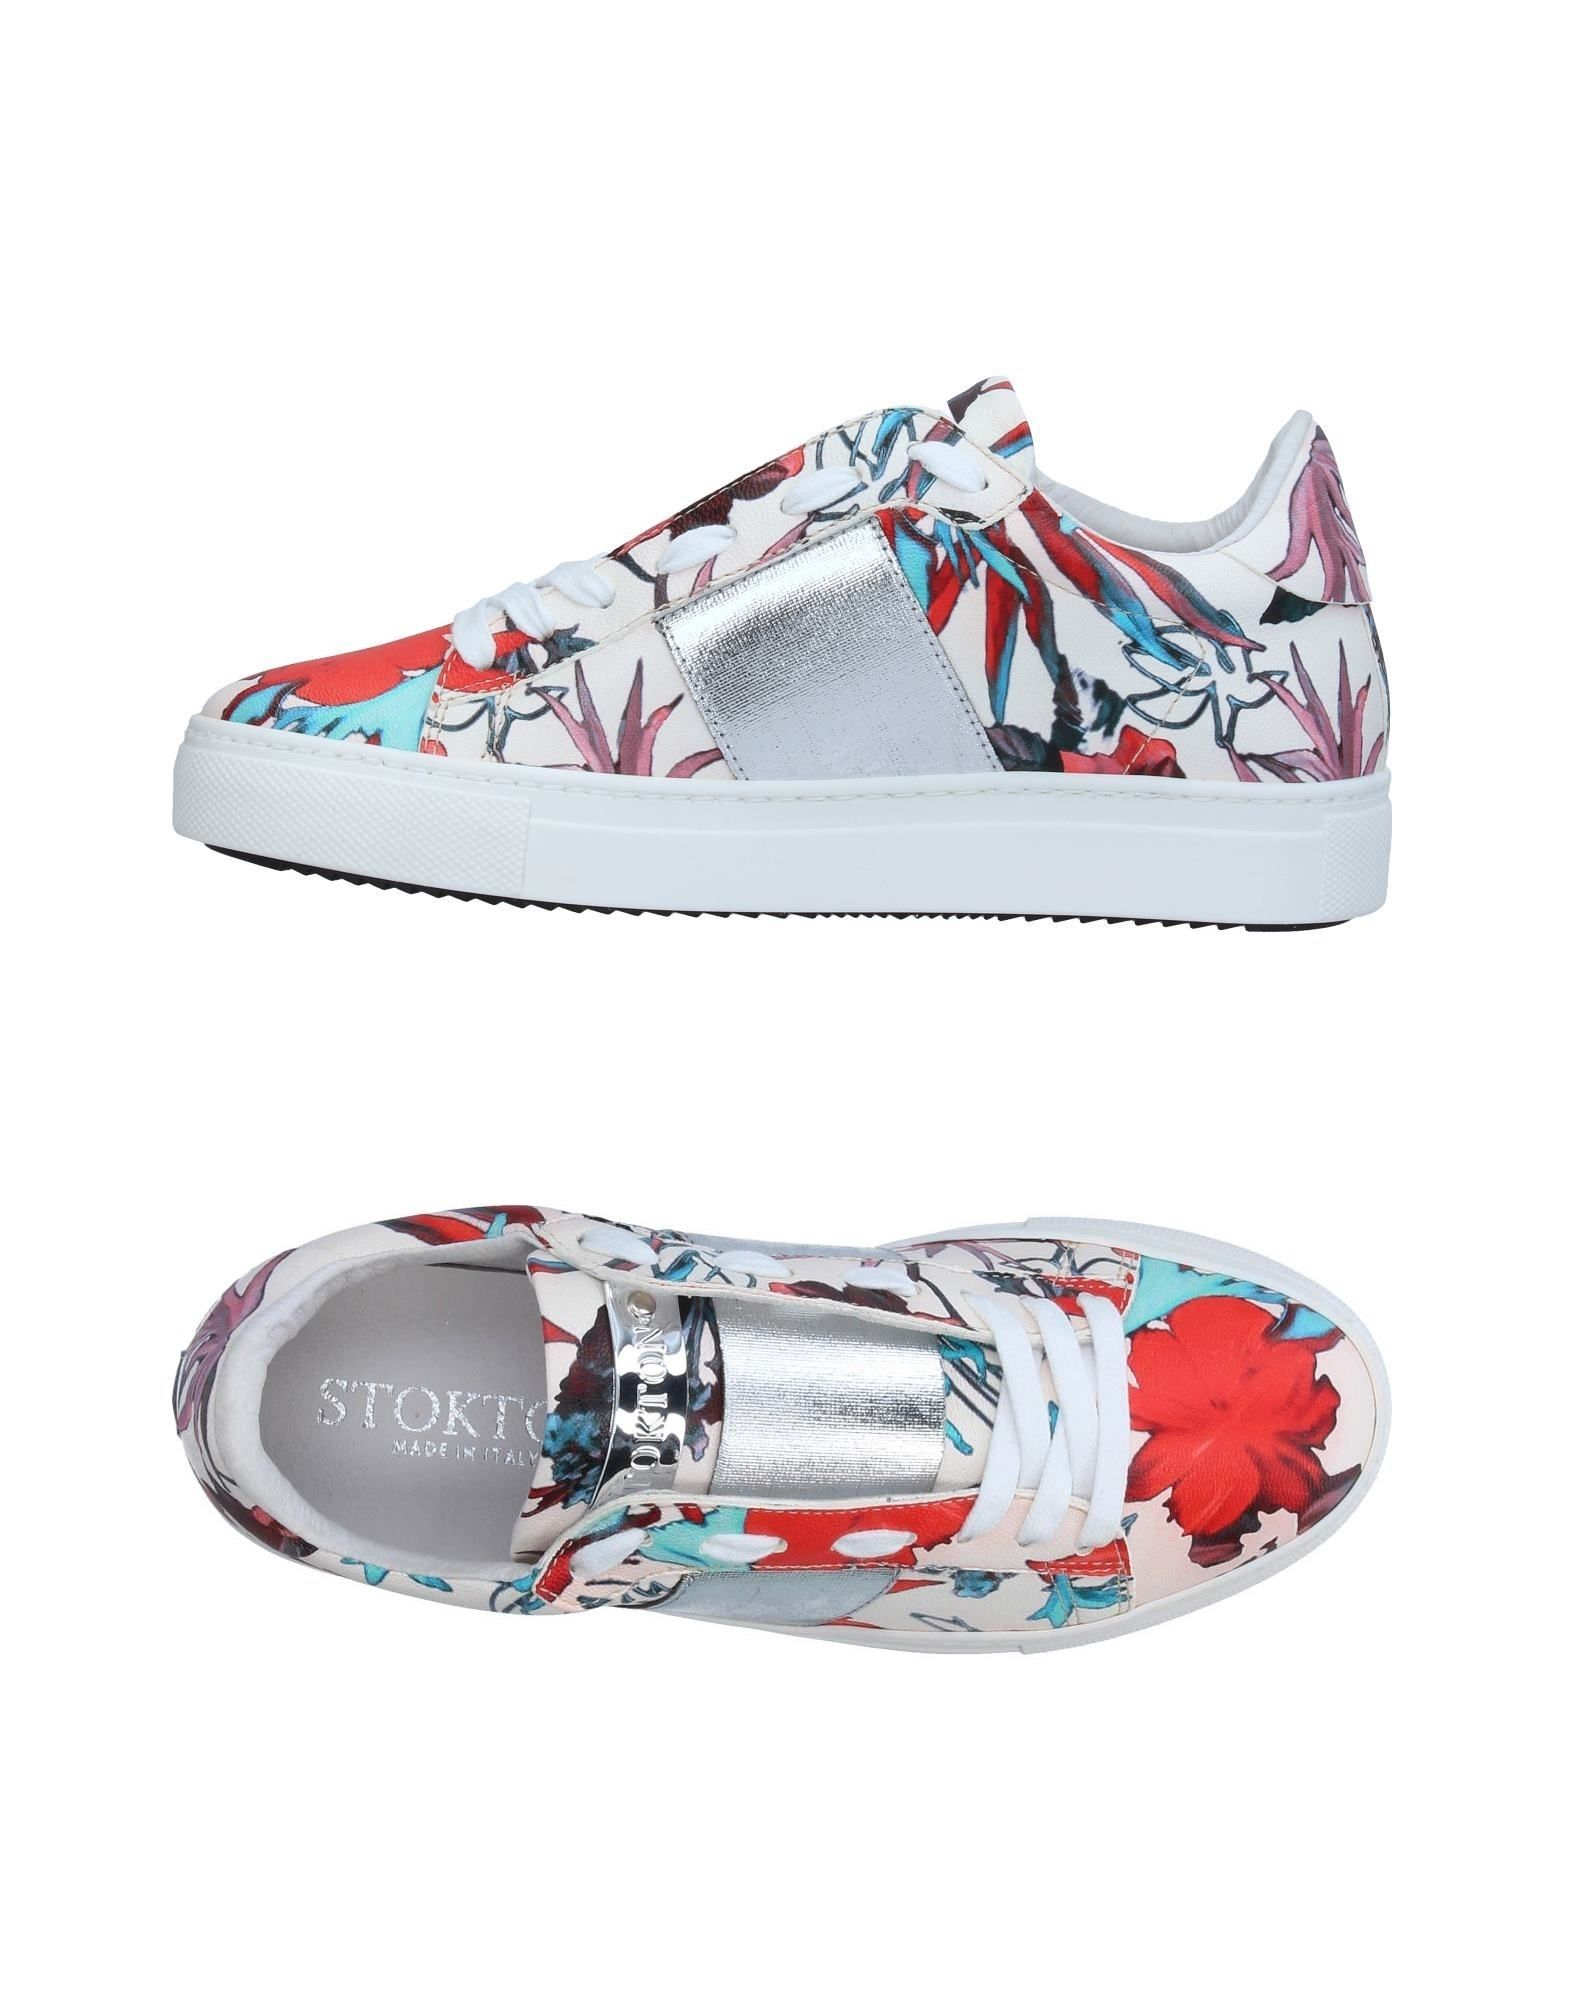 STOKTON Damen Low Sneakers & Tennisschuhe Farbe Rosa Größe 3